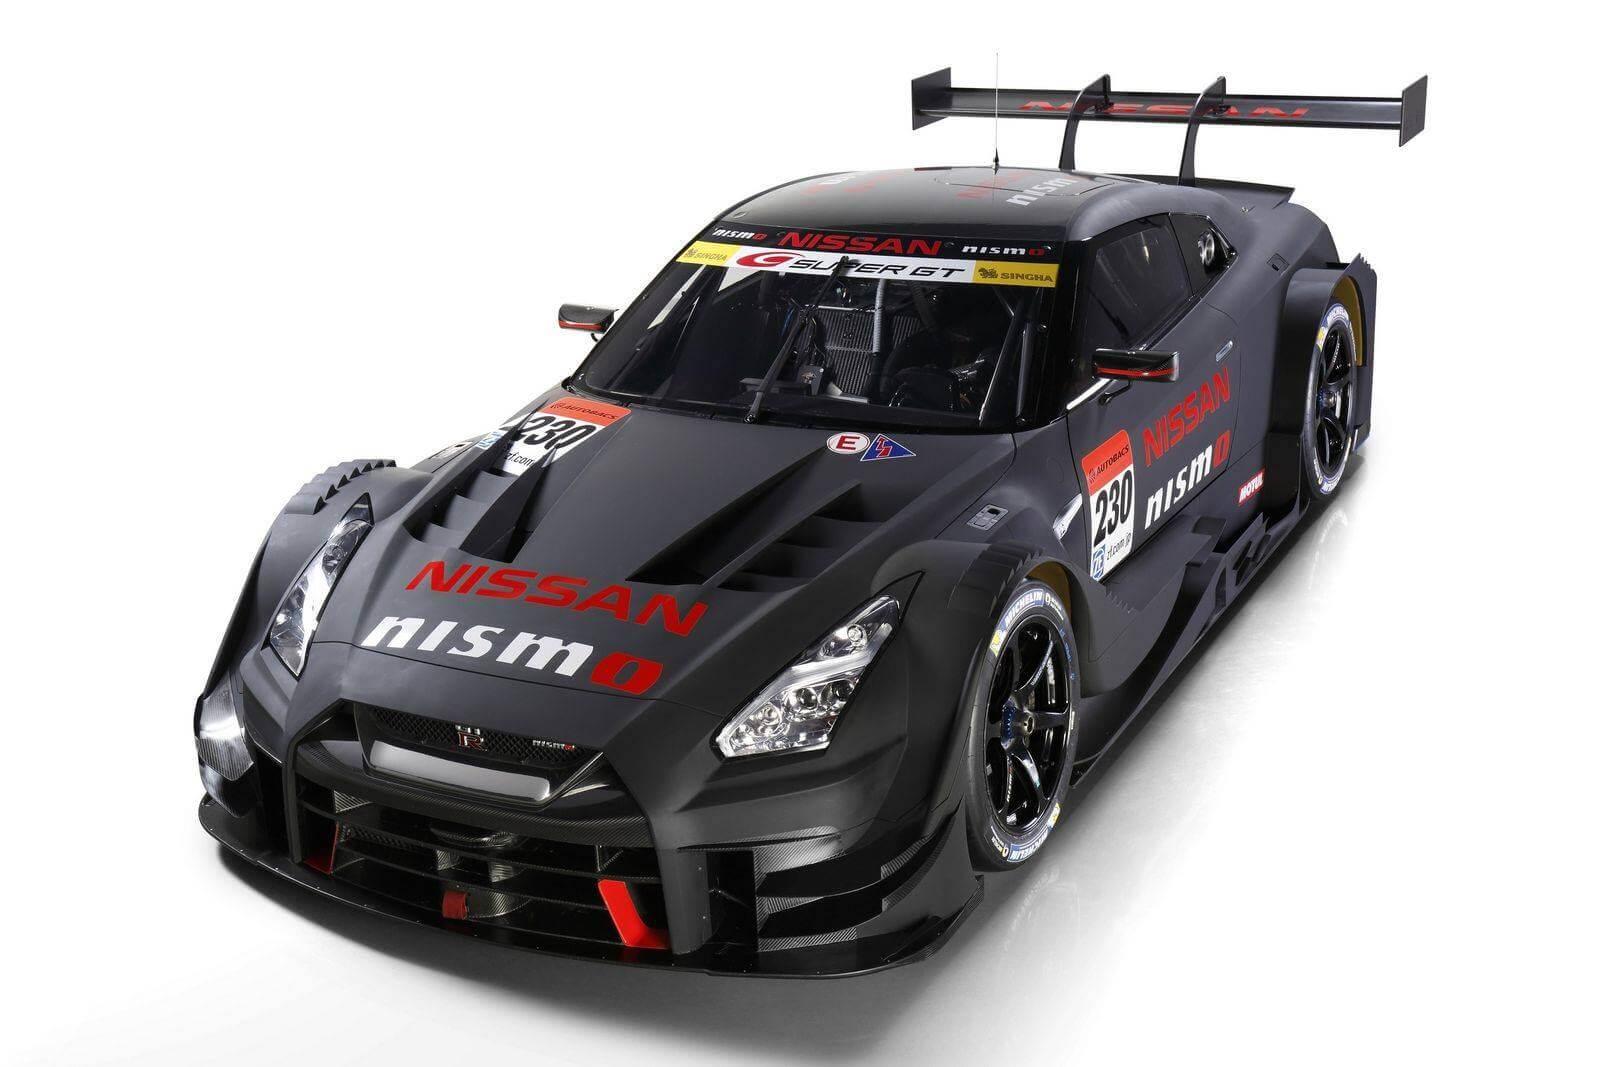 Nissan-GT-R-Nismo-GT-nissan-gtr-motorsport-wallpaper-wp5808279